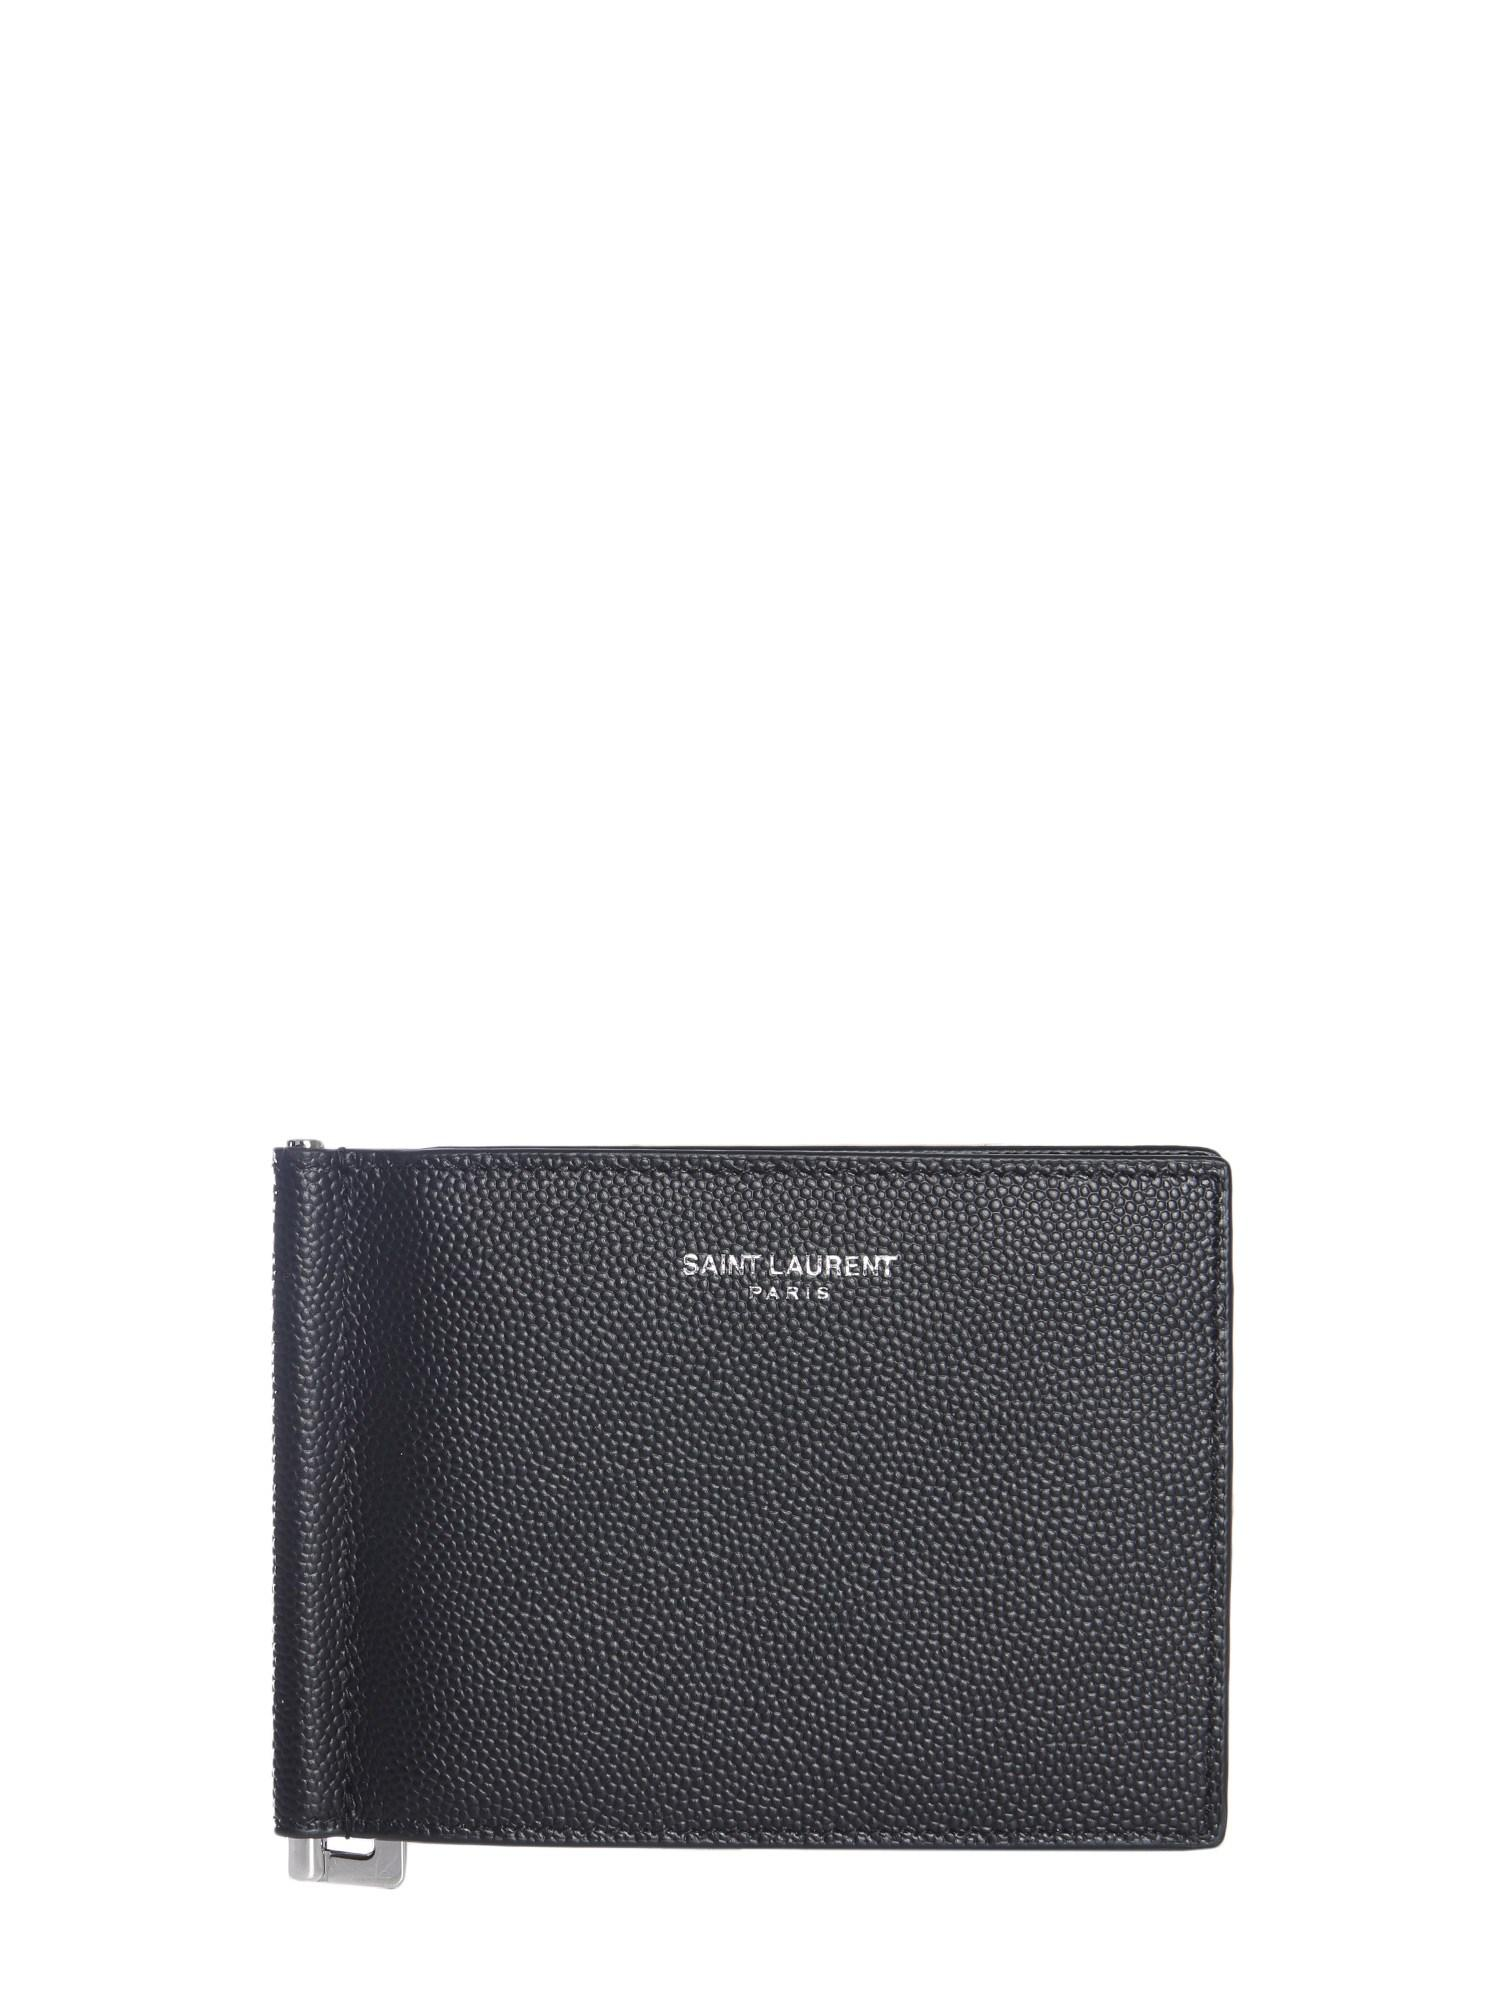 2f088a9d6b3 Saint Laurent Granulated Leather Card Holder in Black for Men - Save ...